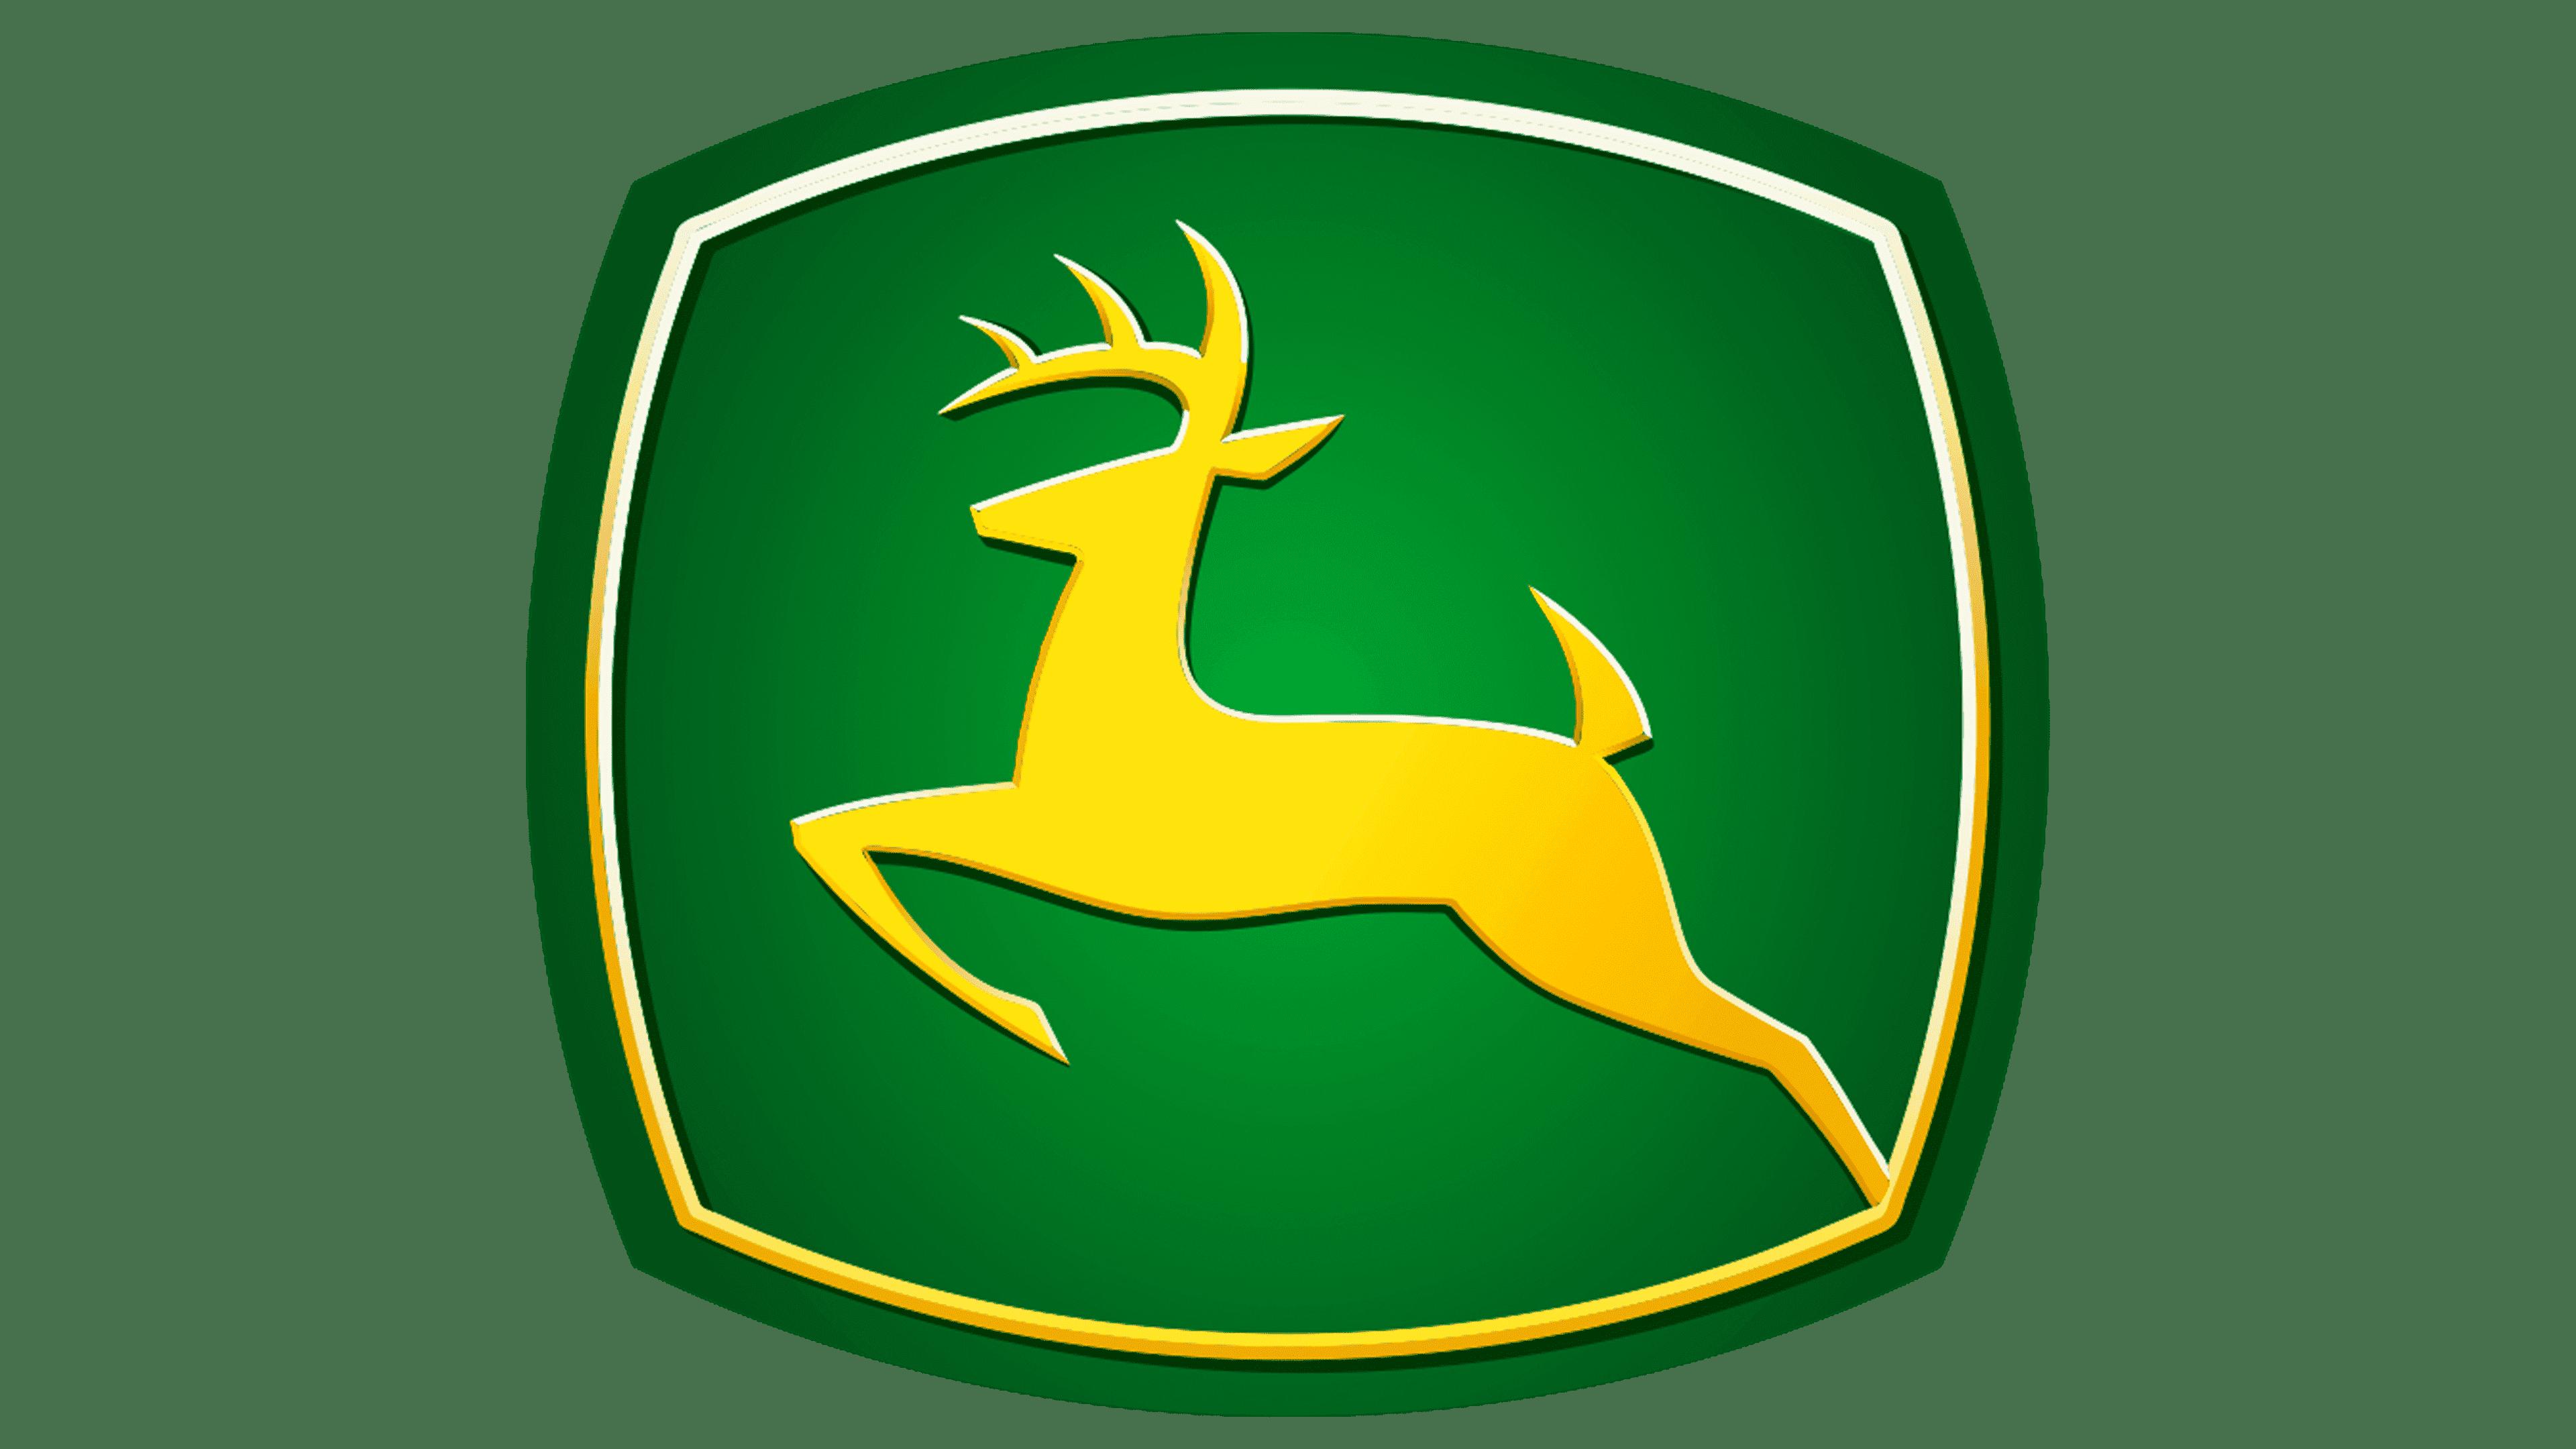 John Deere embleml